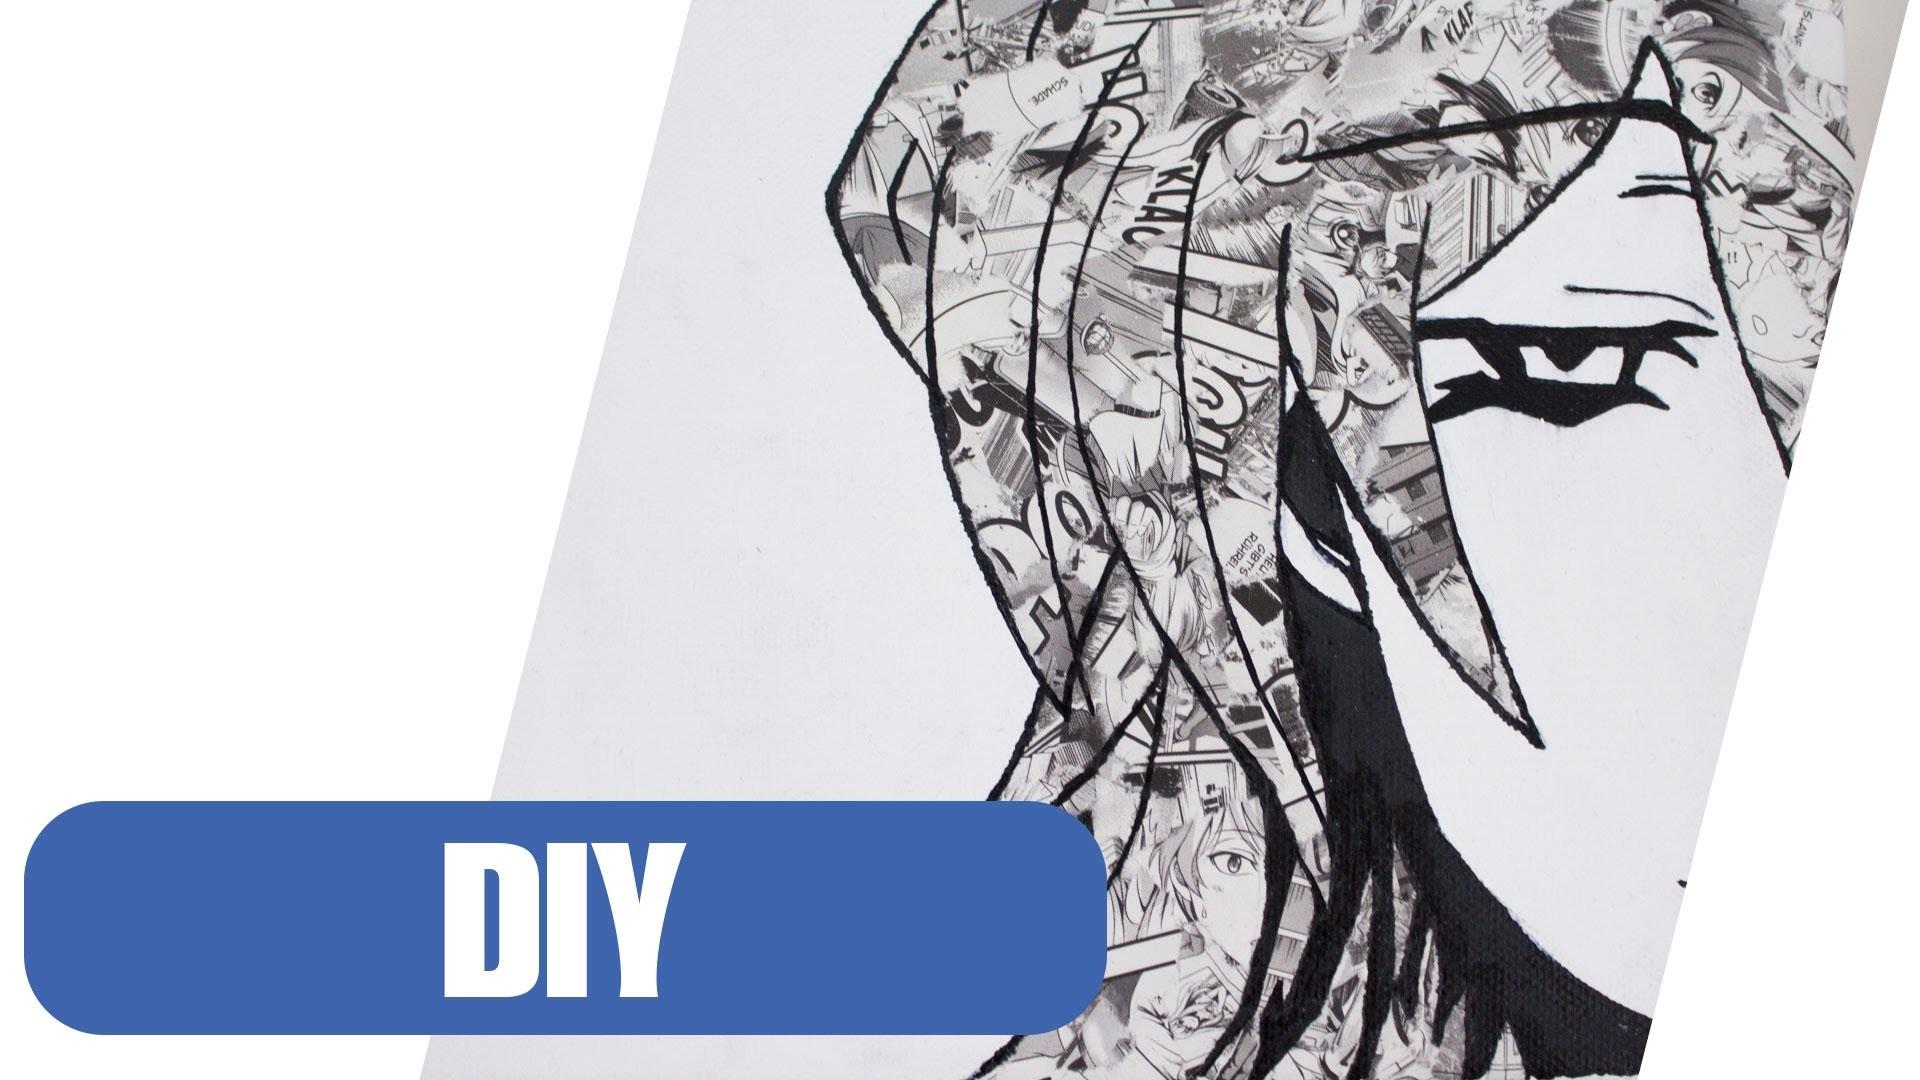 DIY: Leinwand Deko im Manga Style selber machen! | Canvas DIY